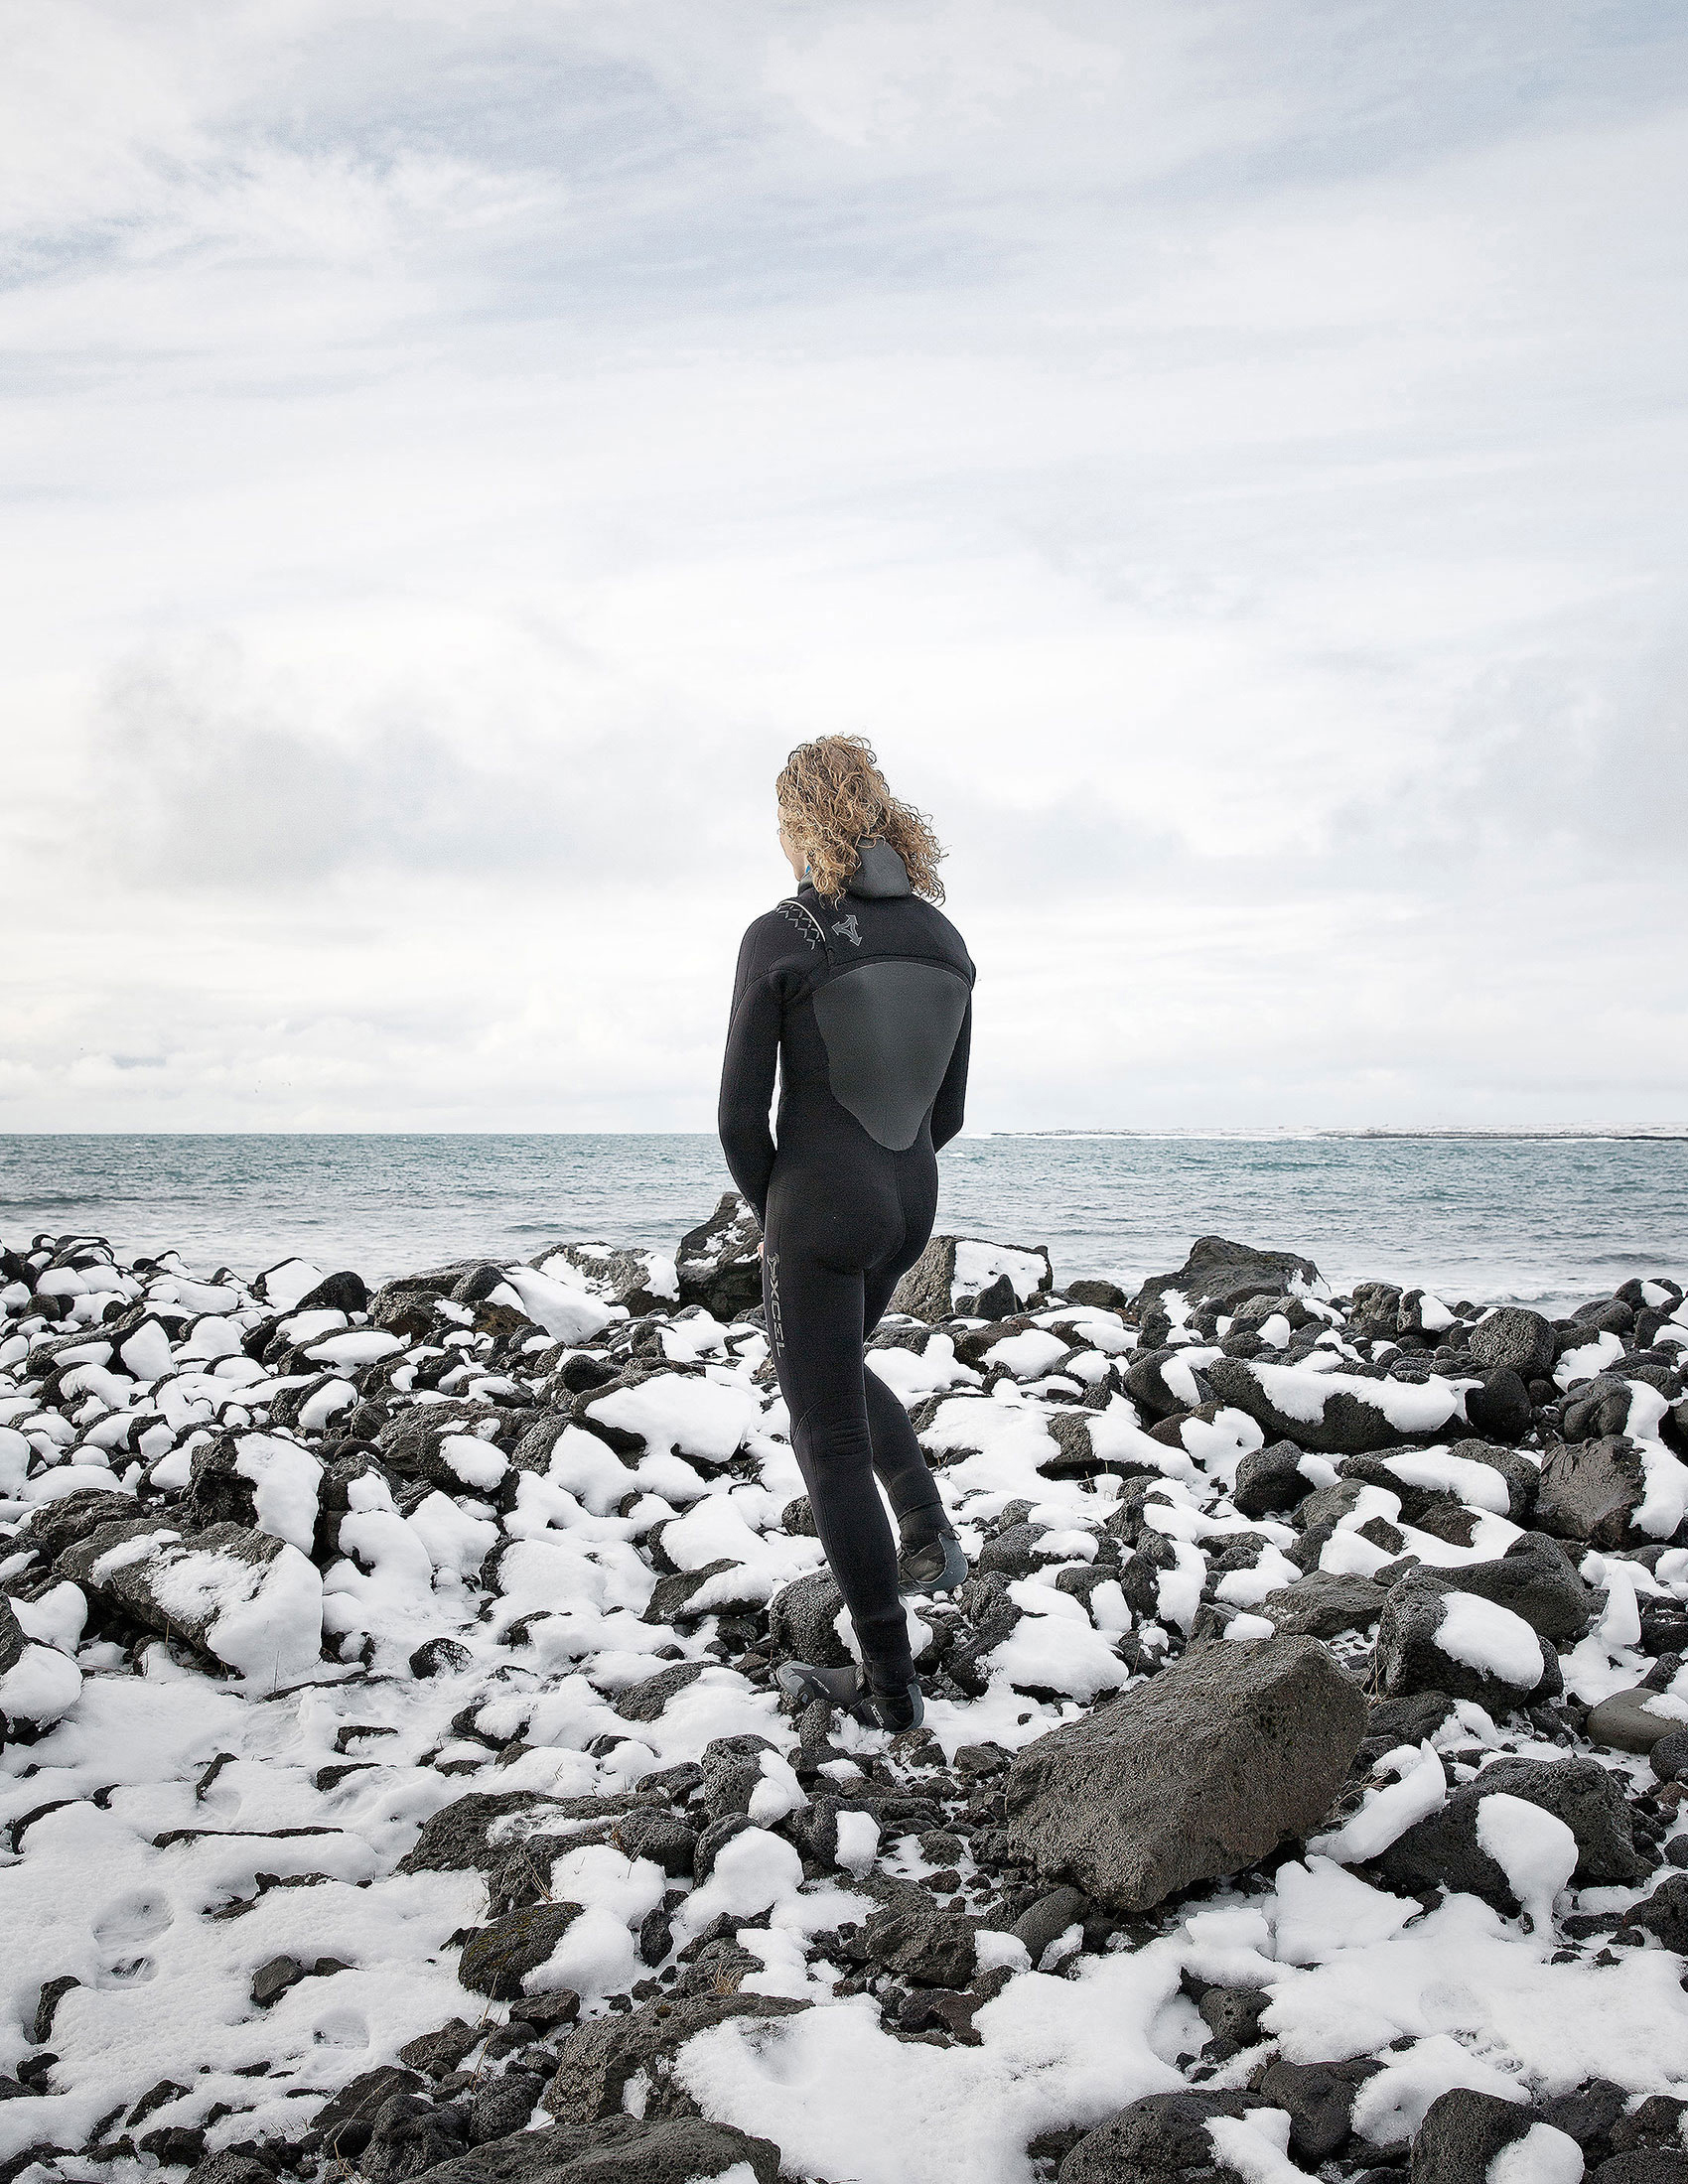 Skubatz_Arctic_Surfers_01.jpg